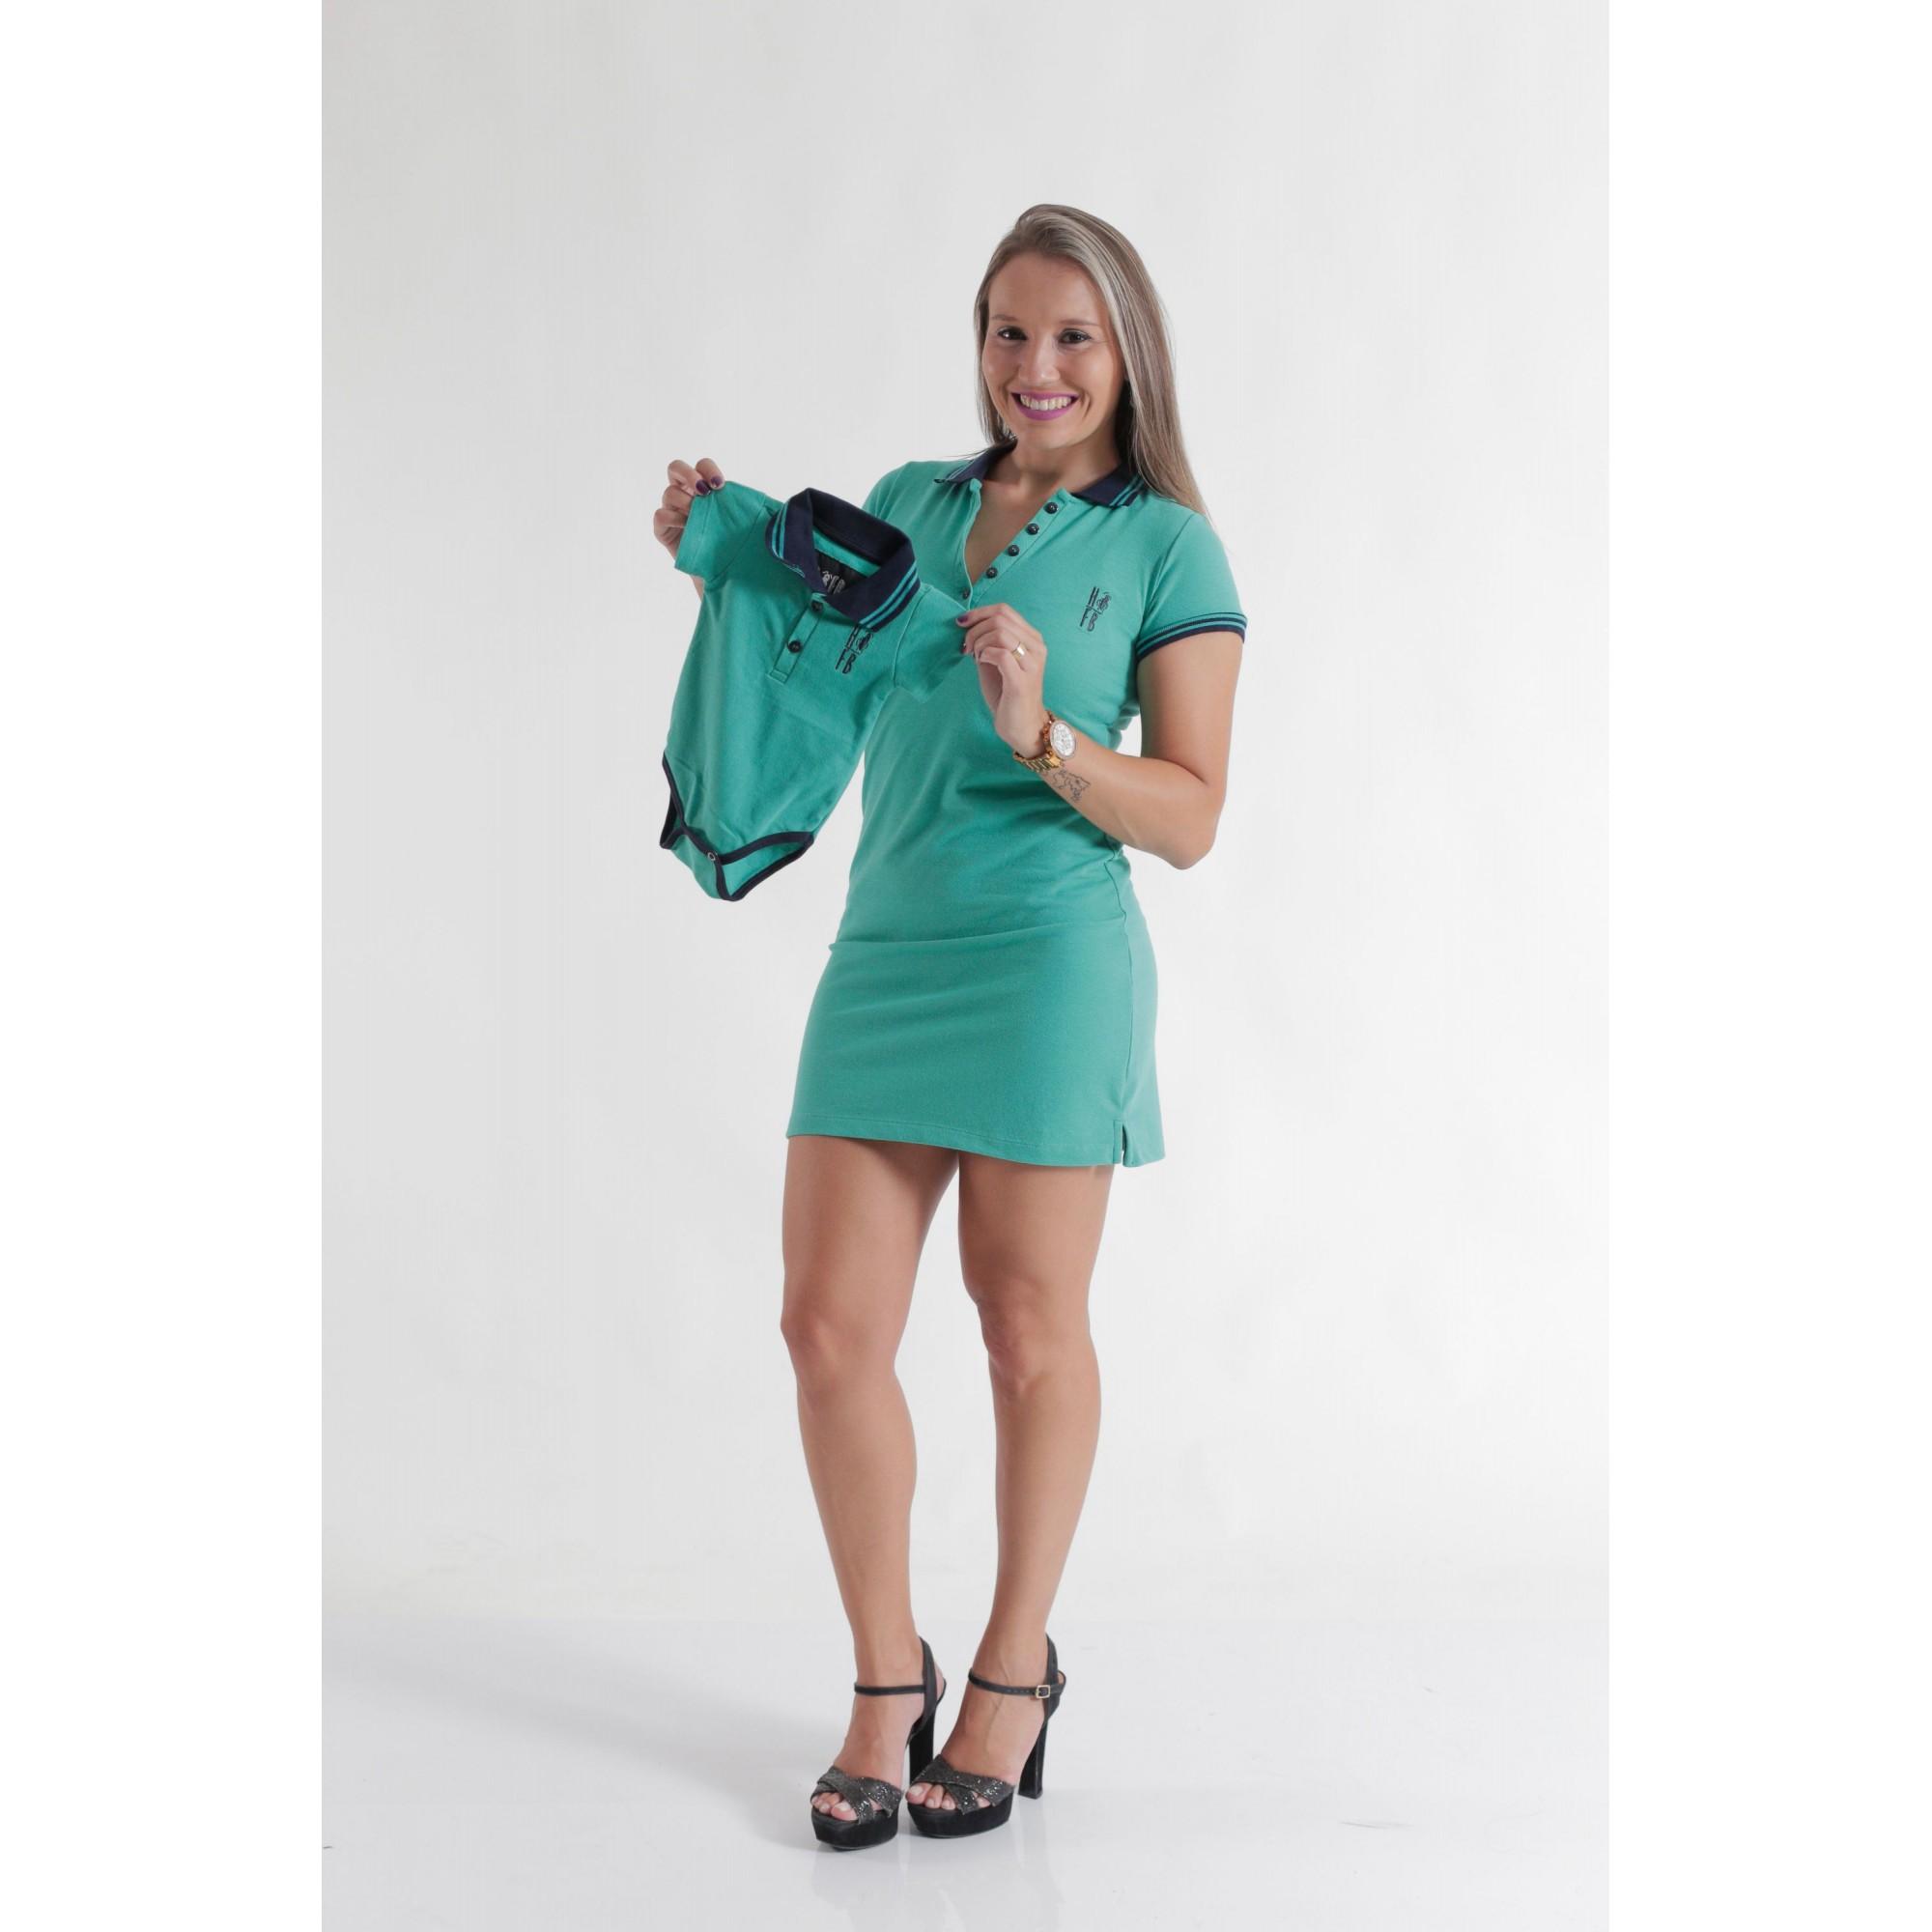 MÃE E FILHO > Kit 02 peças Vestido + Body Unissex Polo - Verde Jade [Coleção Tal Mãe Tal Filho]  - Heitor Fashion Brazil